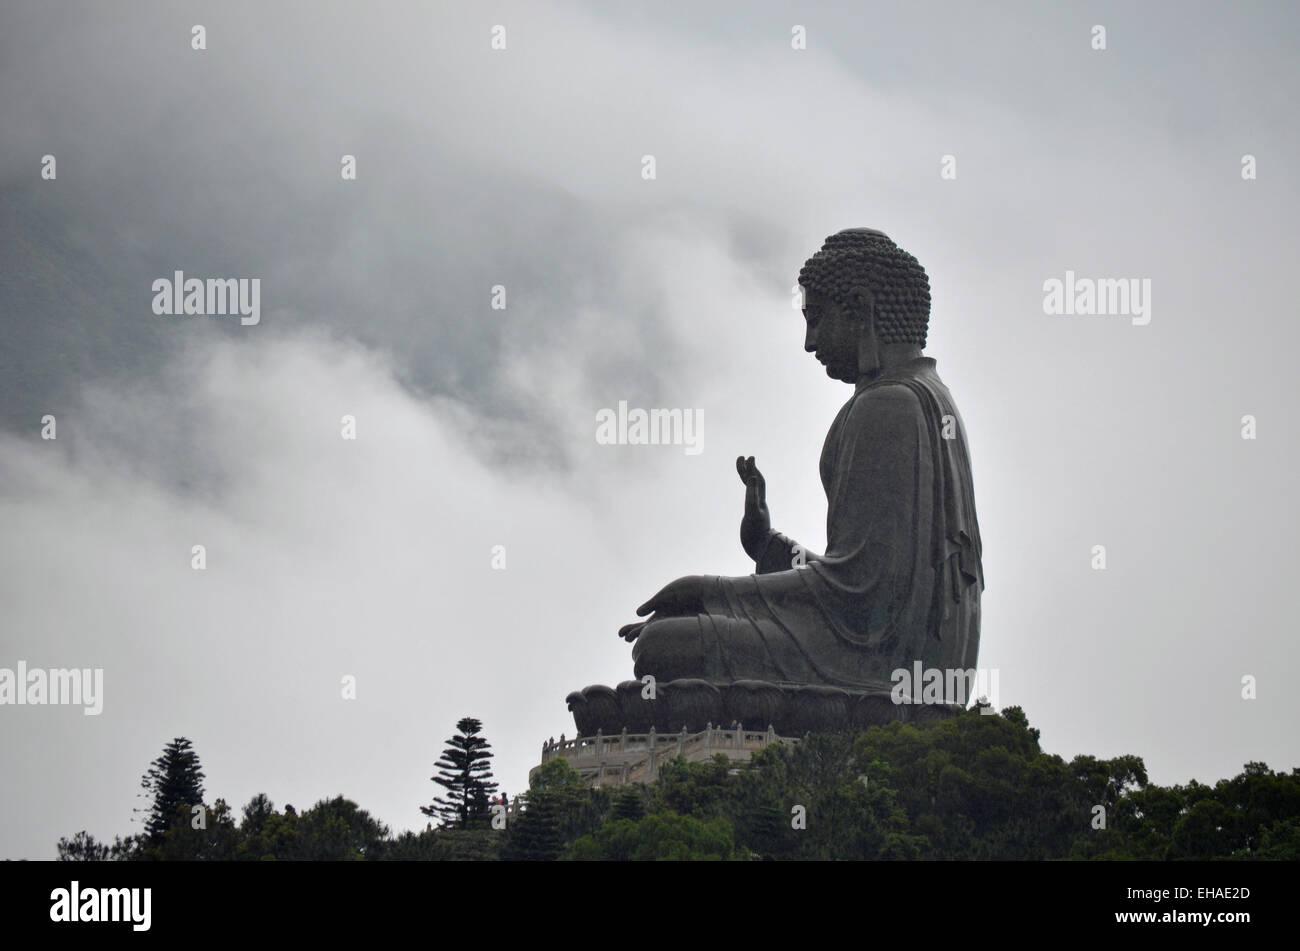 Tian Tan Buddha, also known as Big Buddha, is a gigantic bronze statue on Lantau Island in Hong Kong. - Stock Image